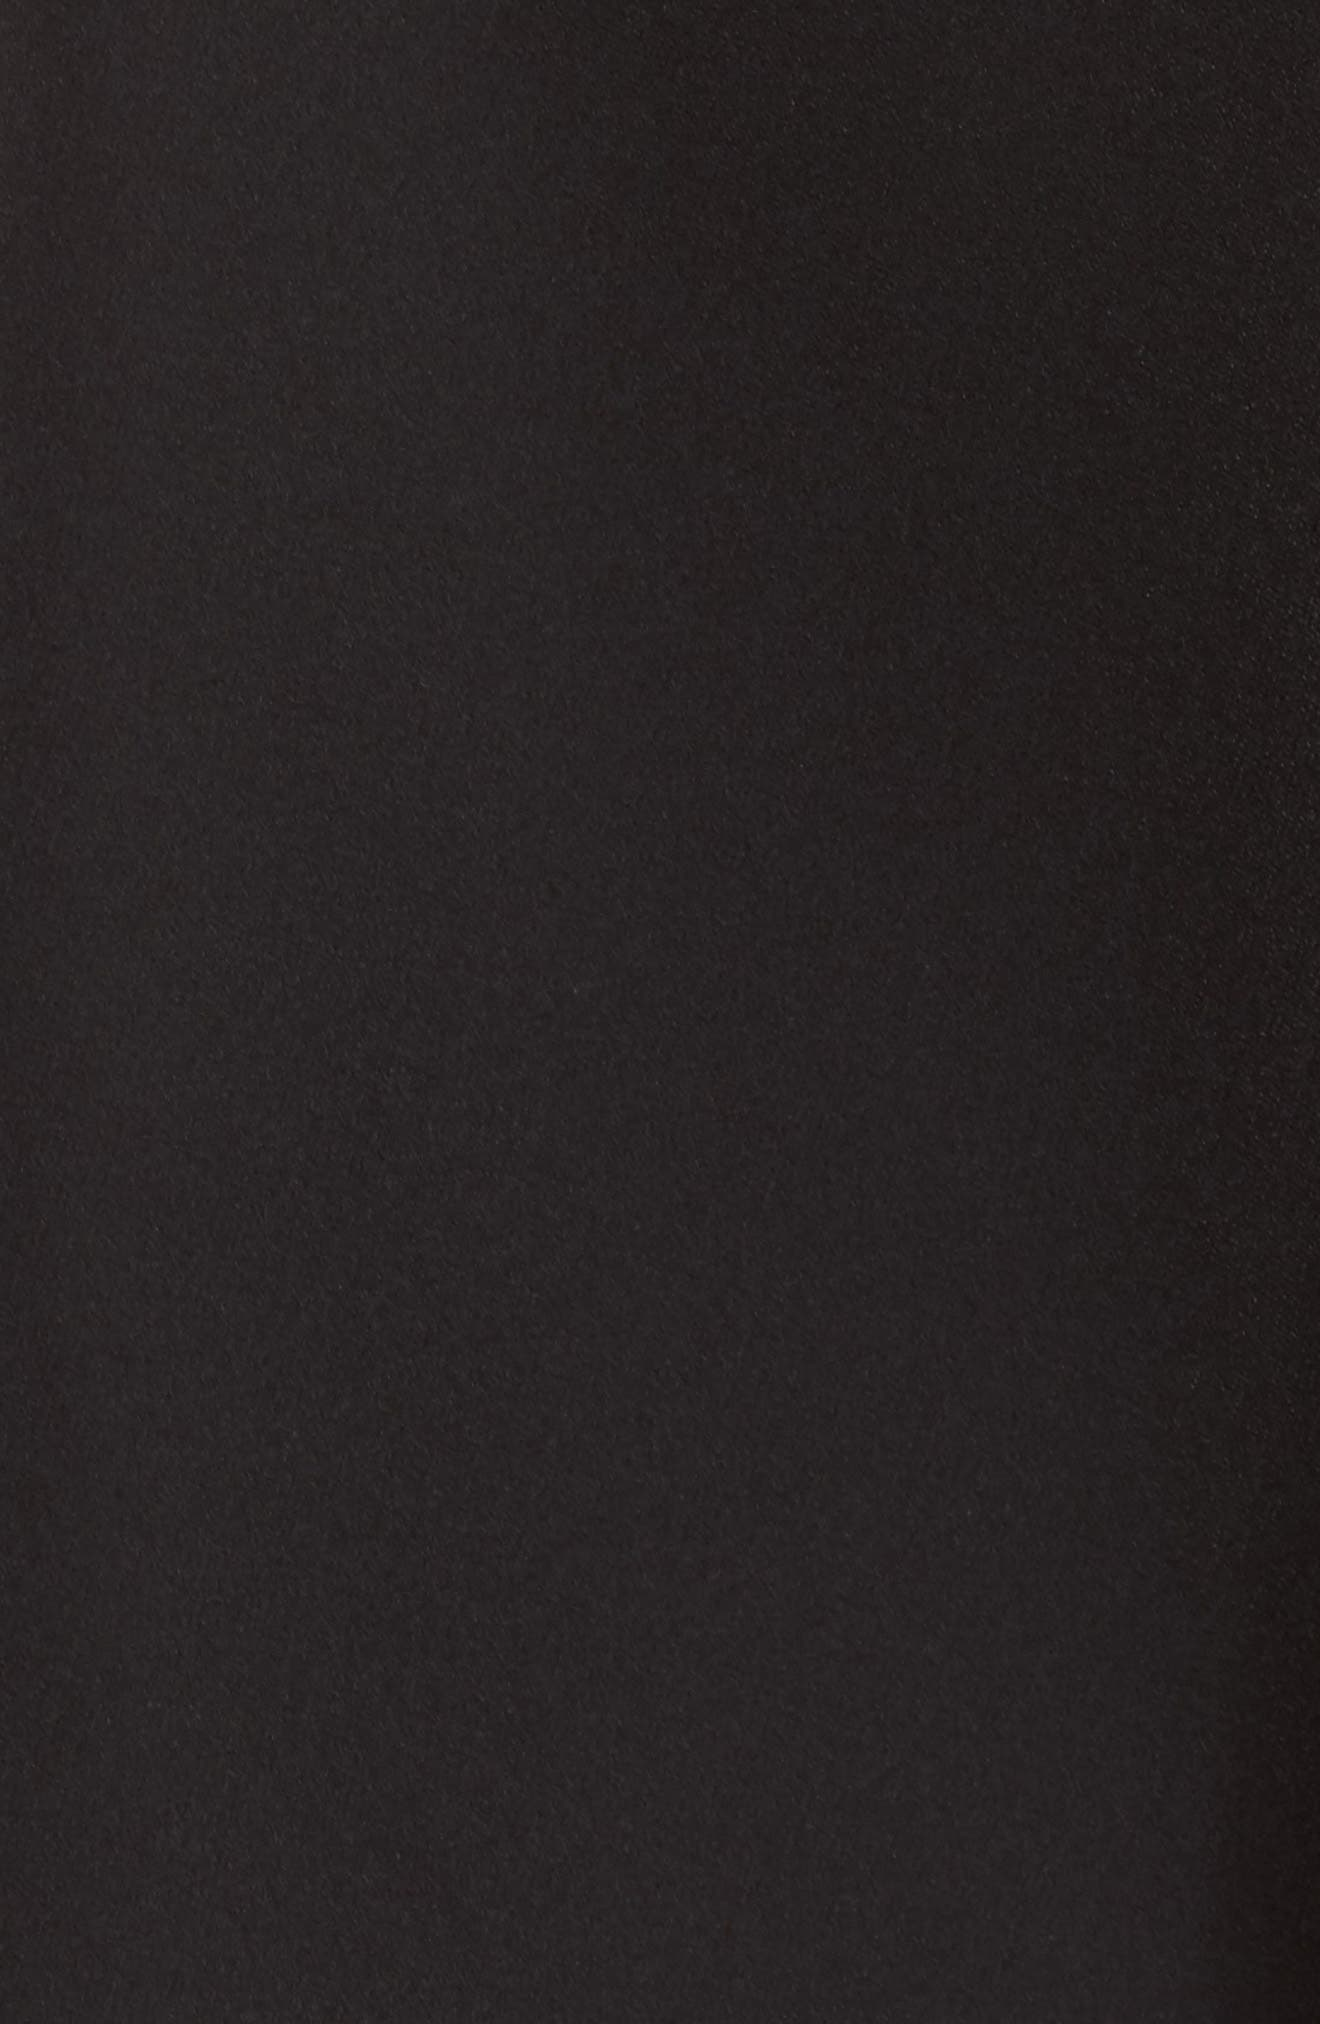 Bianca Back Cutout Fit & Flare Dress,                             Alternate thumbnail 69, color,